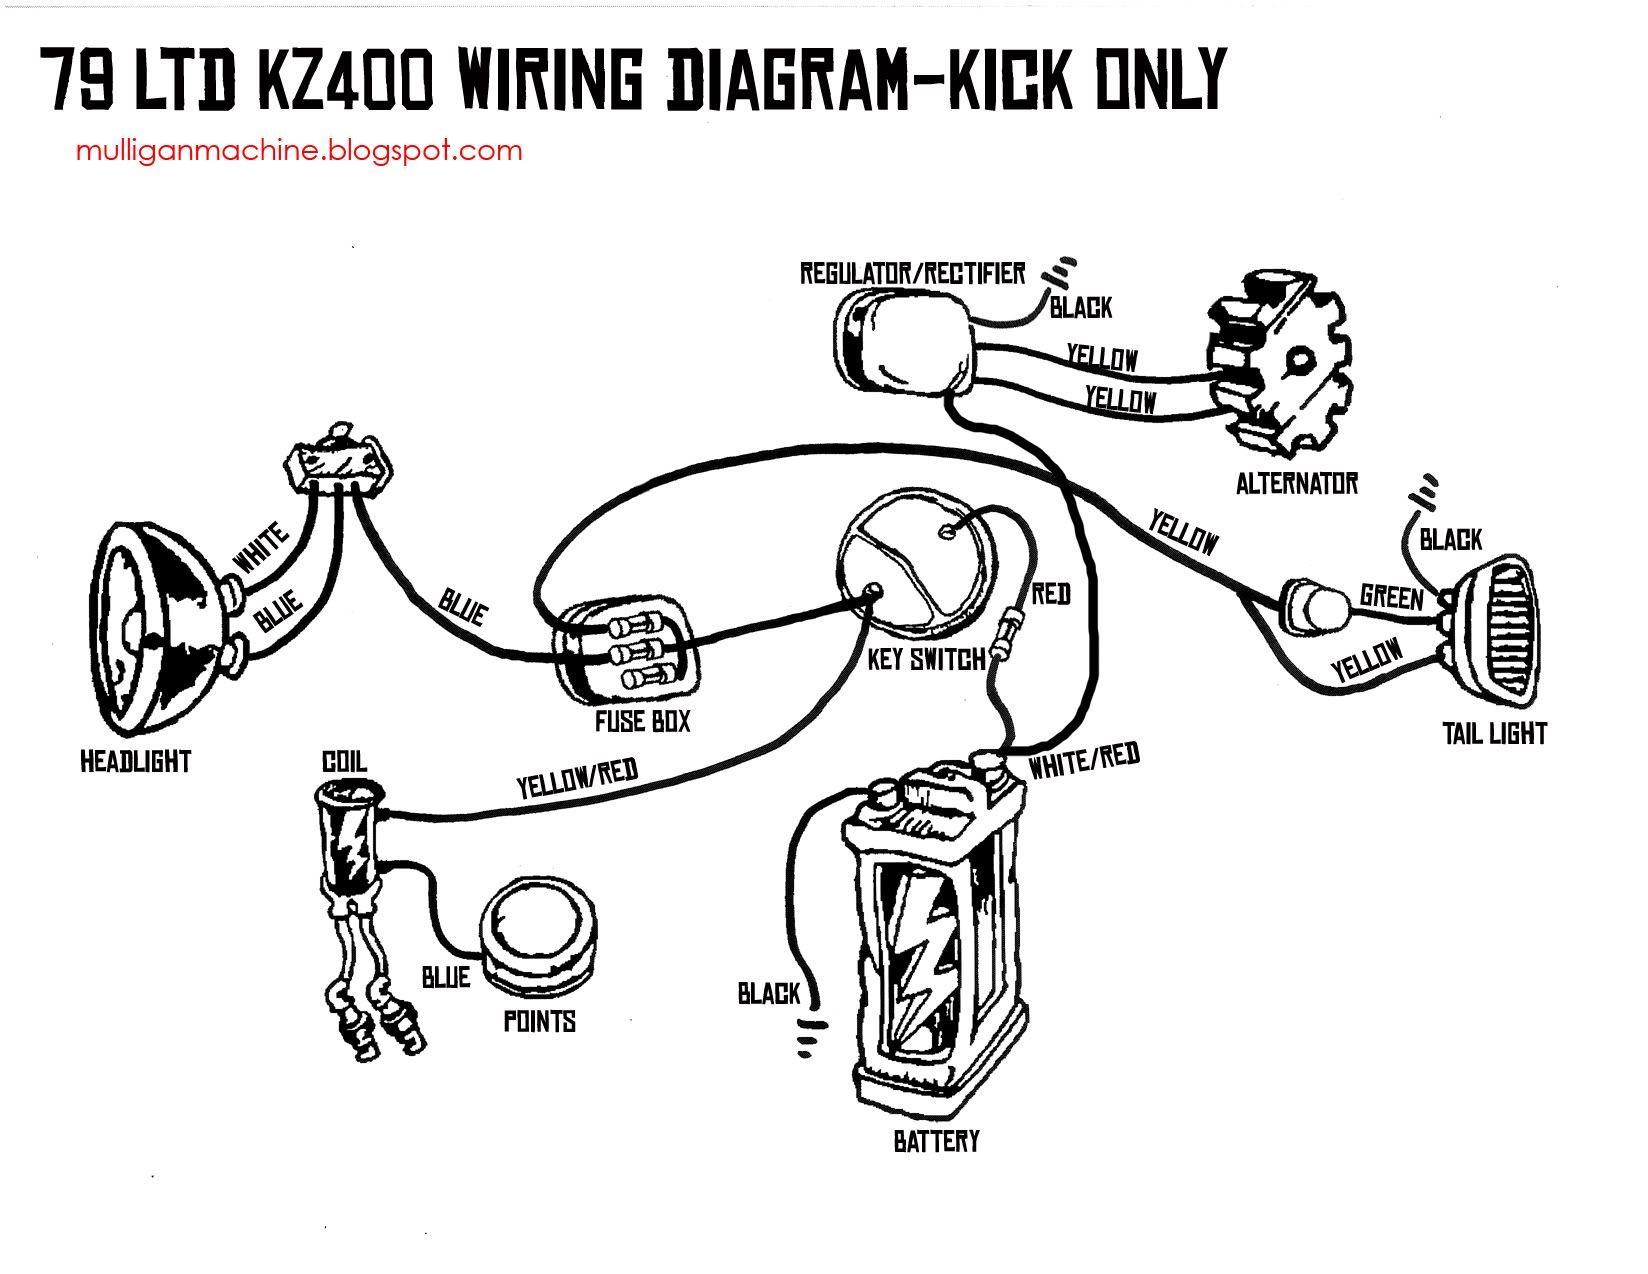 Kz400 bratcafe bangarang just cool stuff pinterest kick only wiring diagram pooptronica